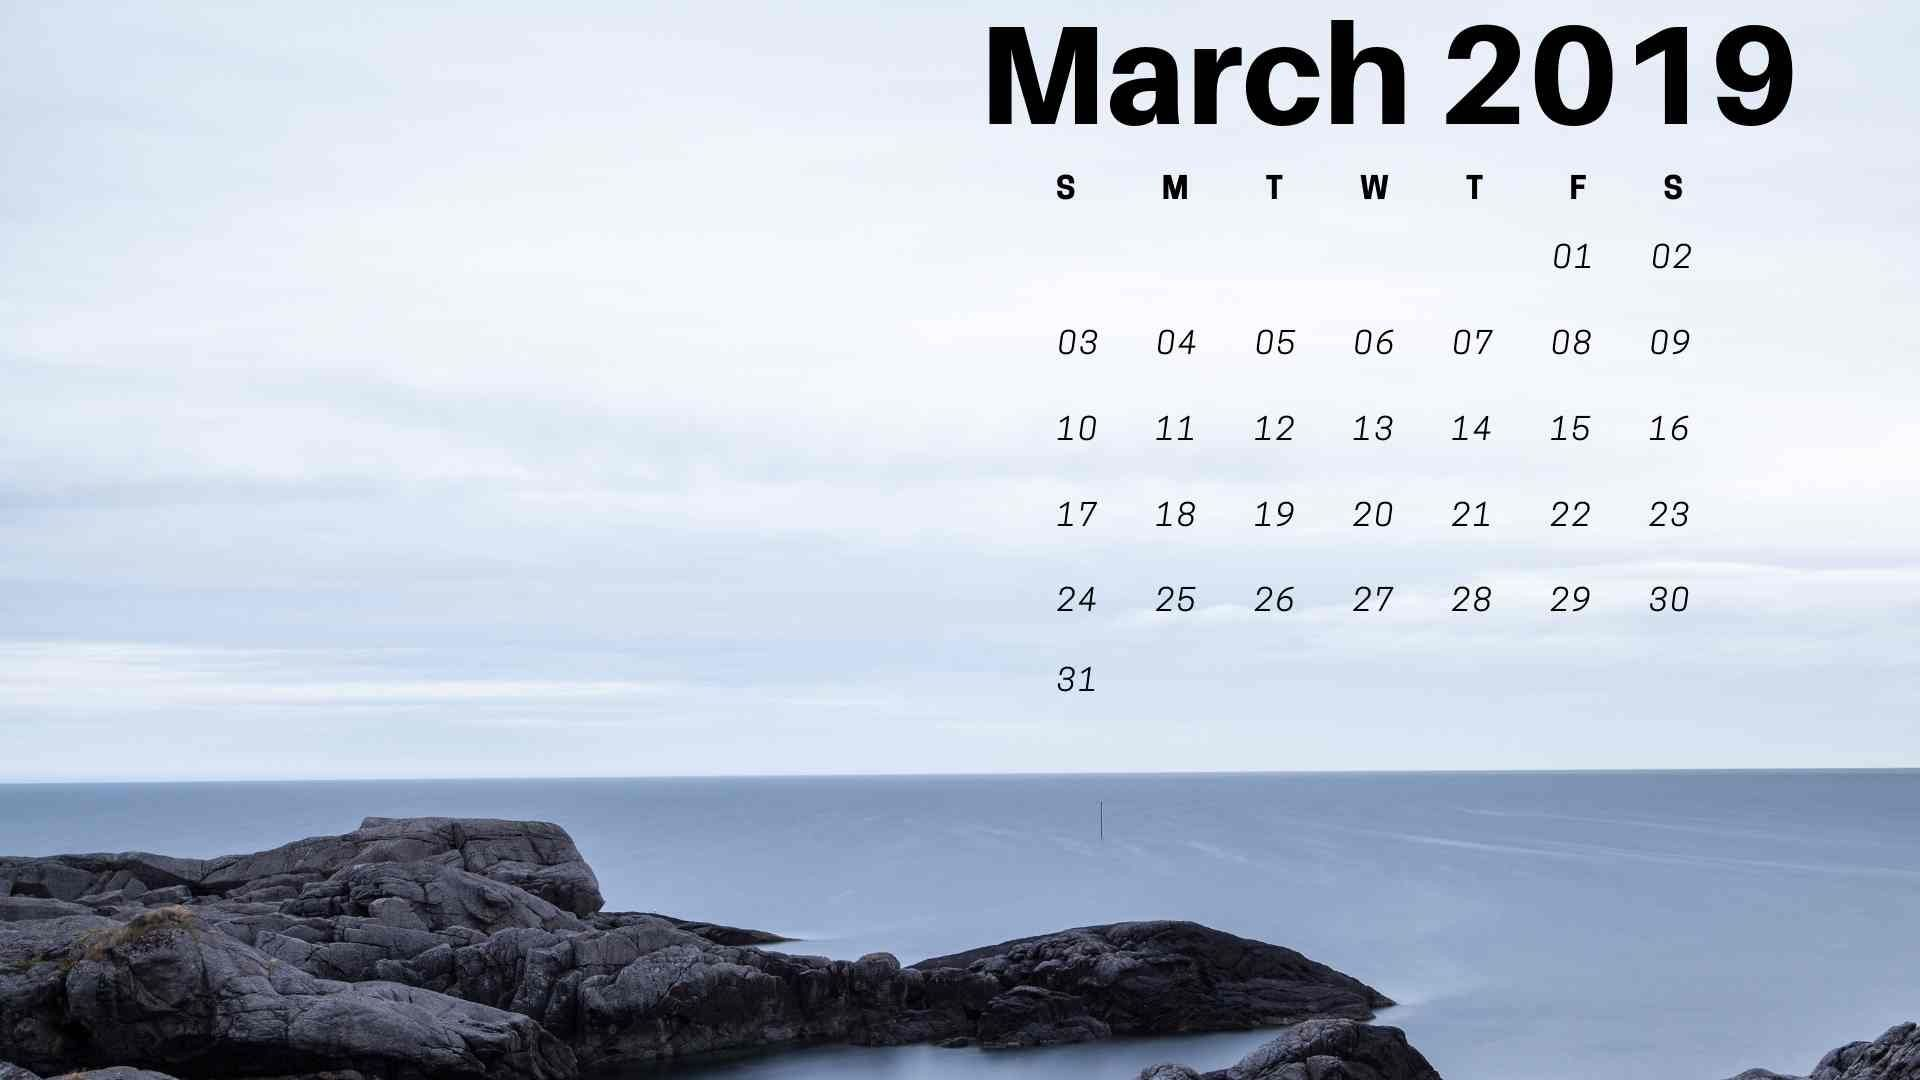 March 2019 Calendar Wallpaper Desktop march calendar calenda2019 Calendar 2019